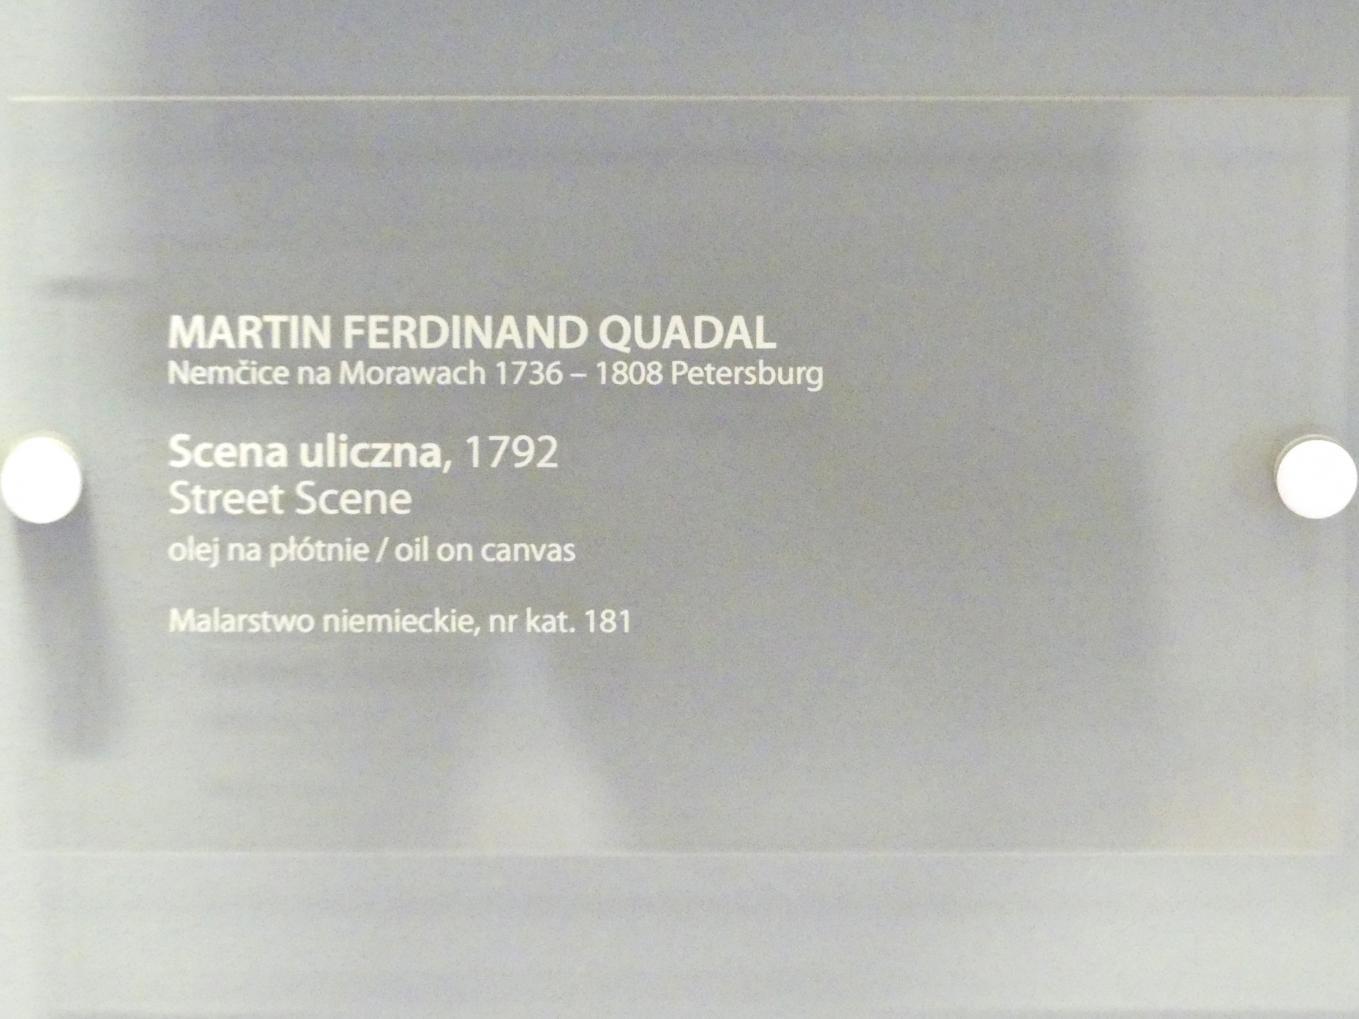 Martin Ferdinand Quadal: Straßenszene, 1792, Bild 2/2